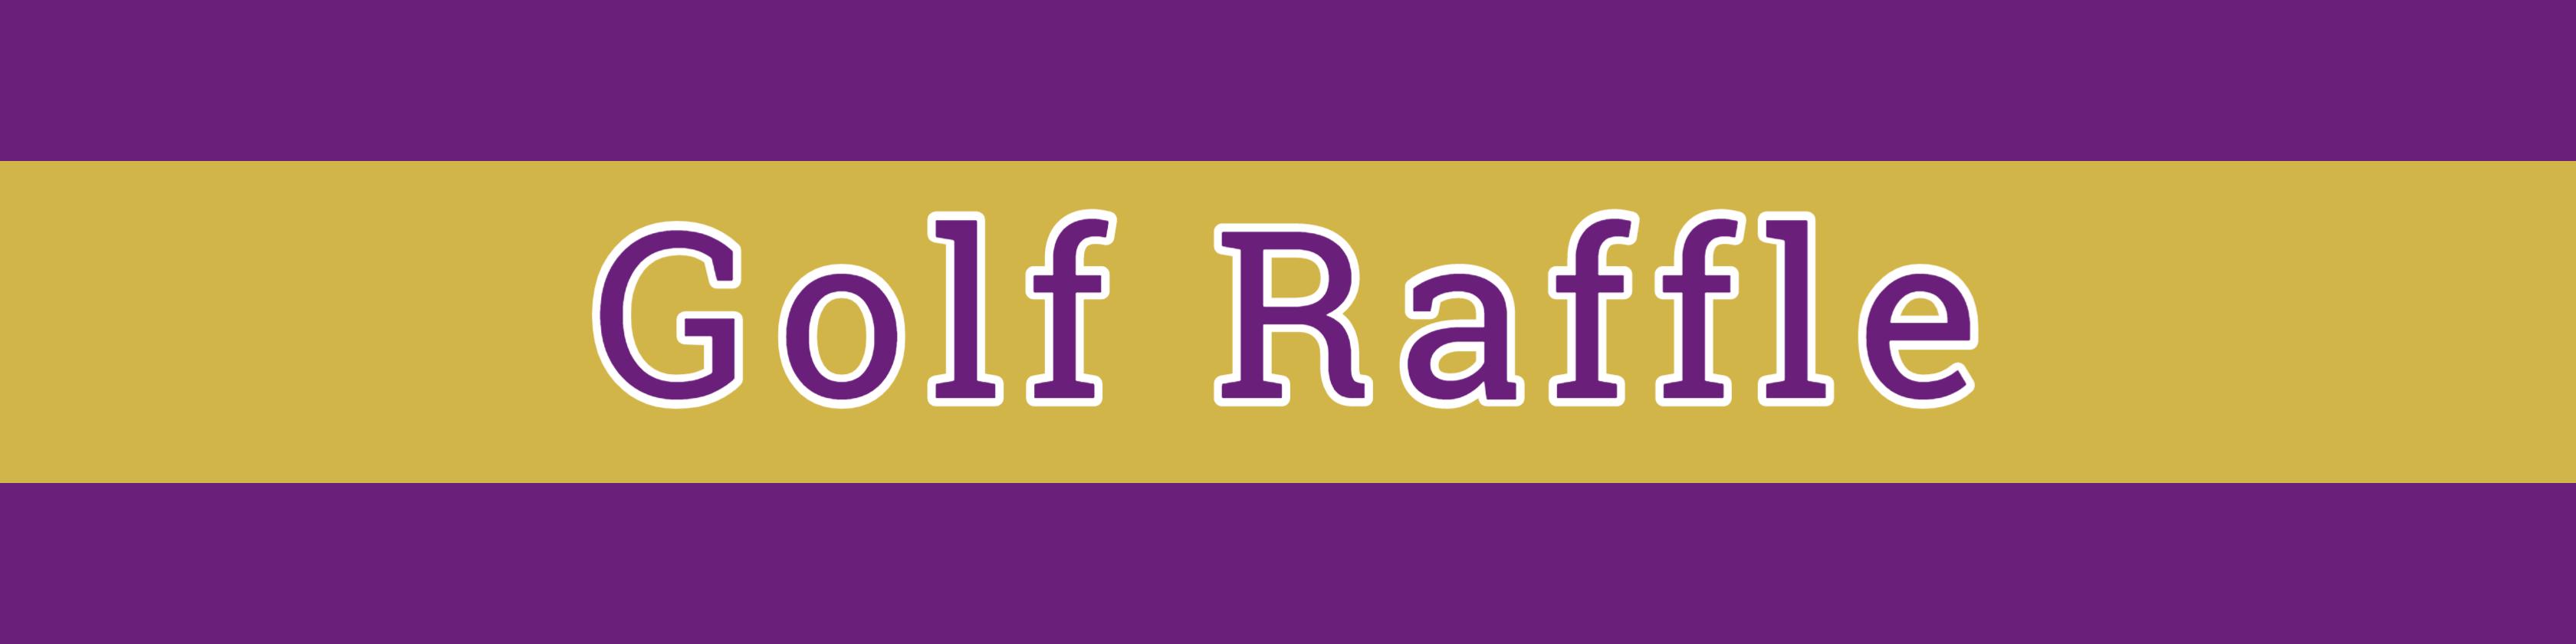 Golf Raffle Header